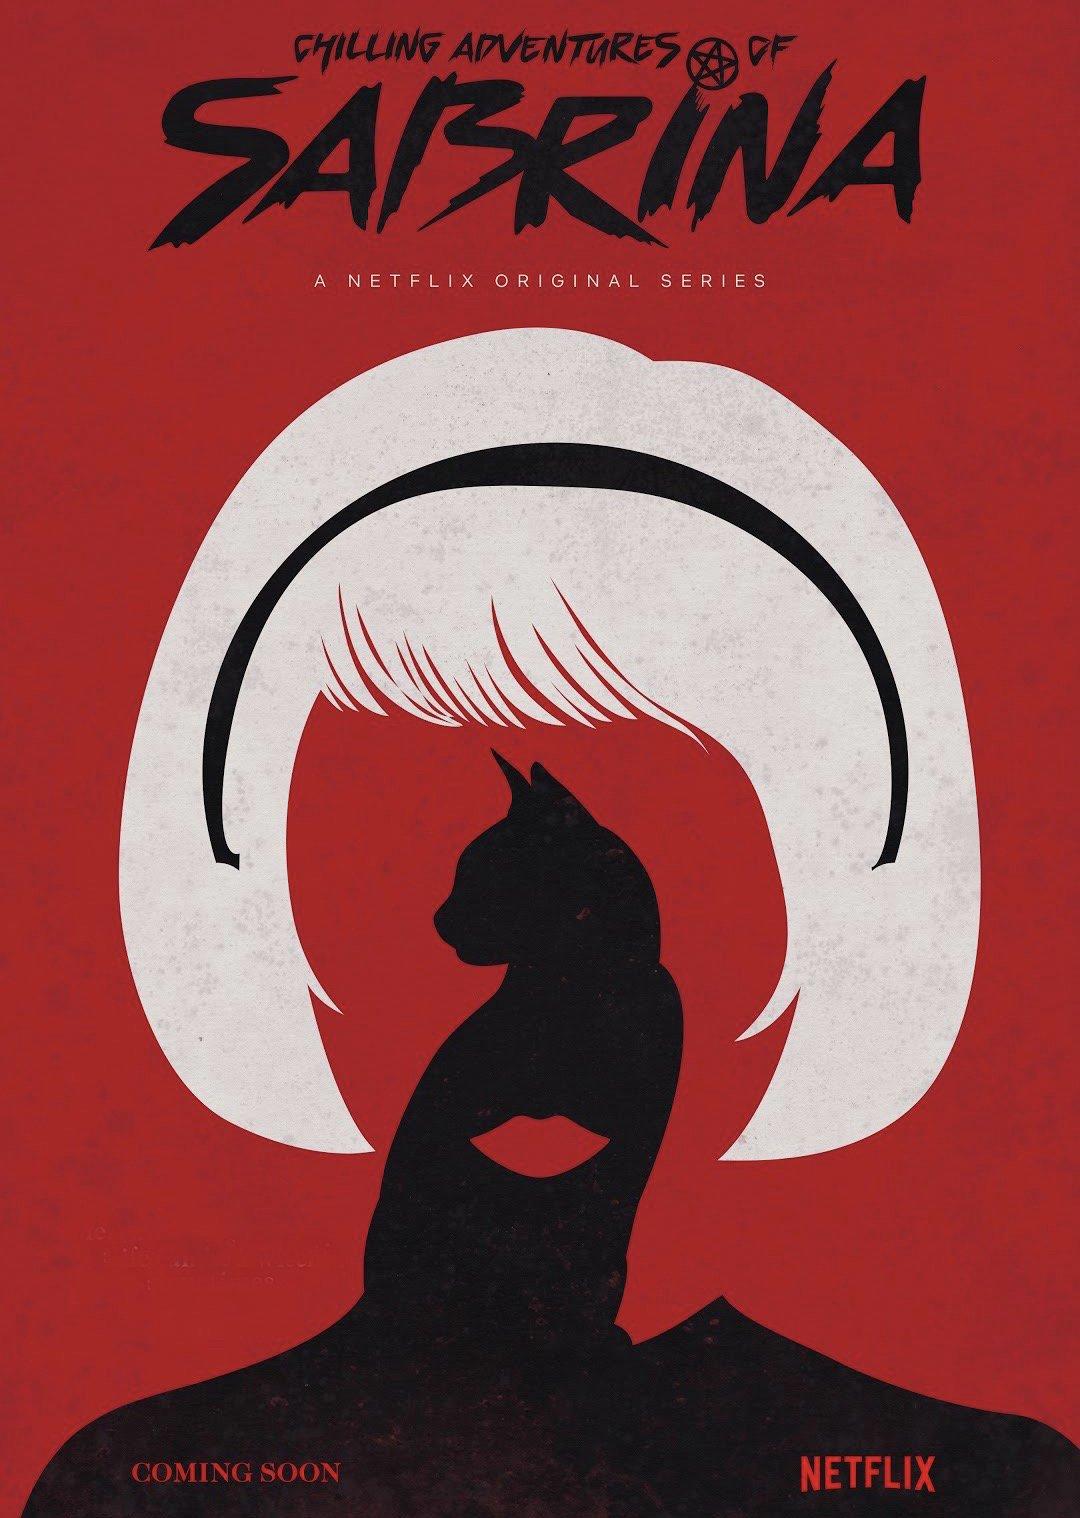 chilling-adventures-of-sabrina-poster.jpg